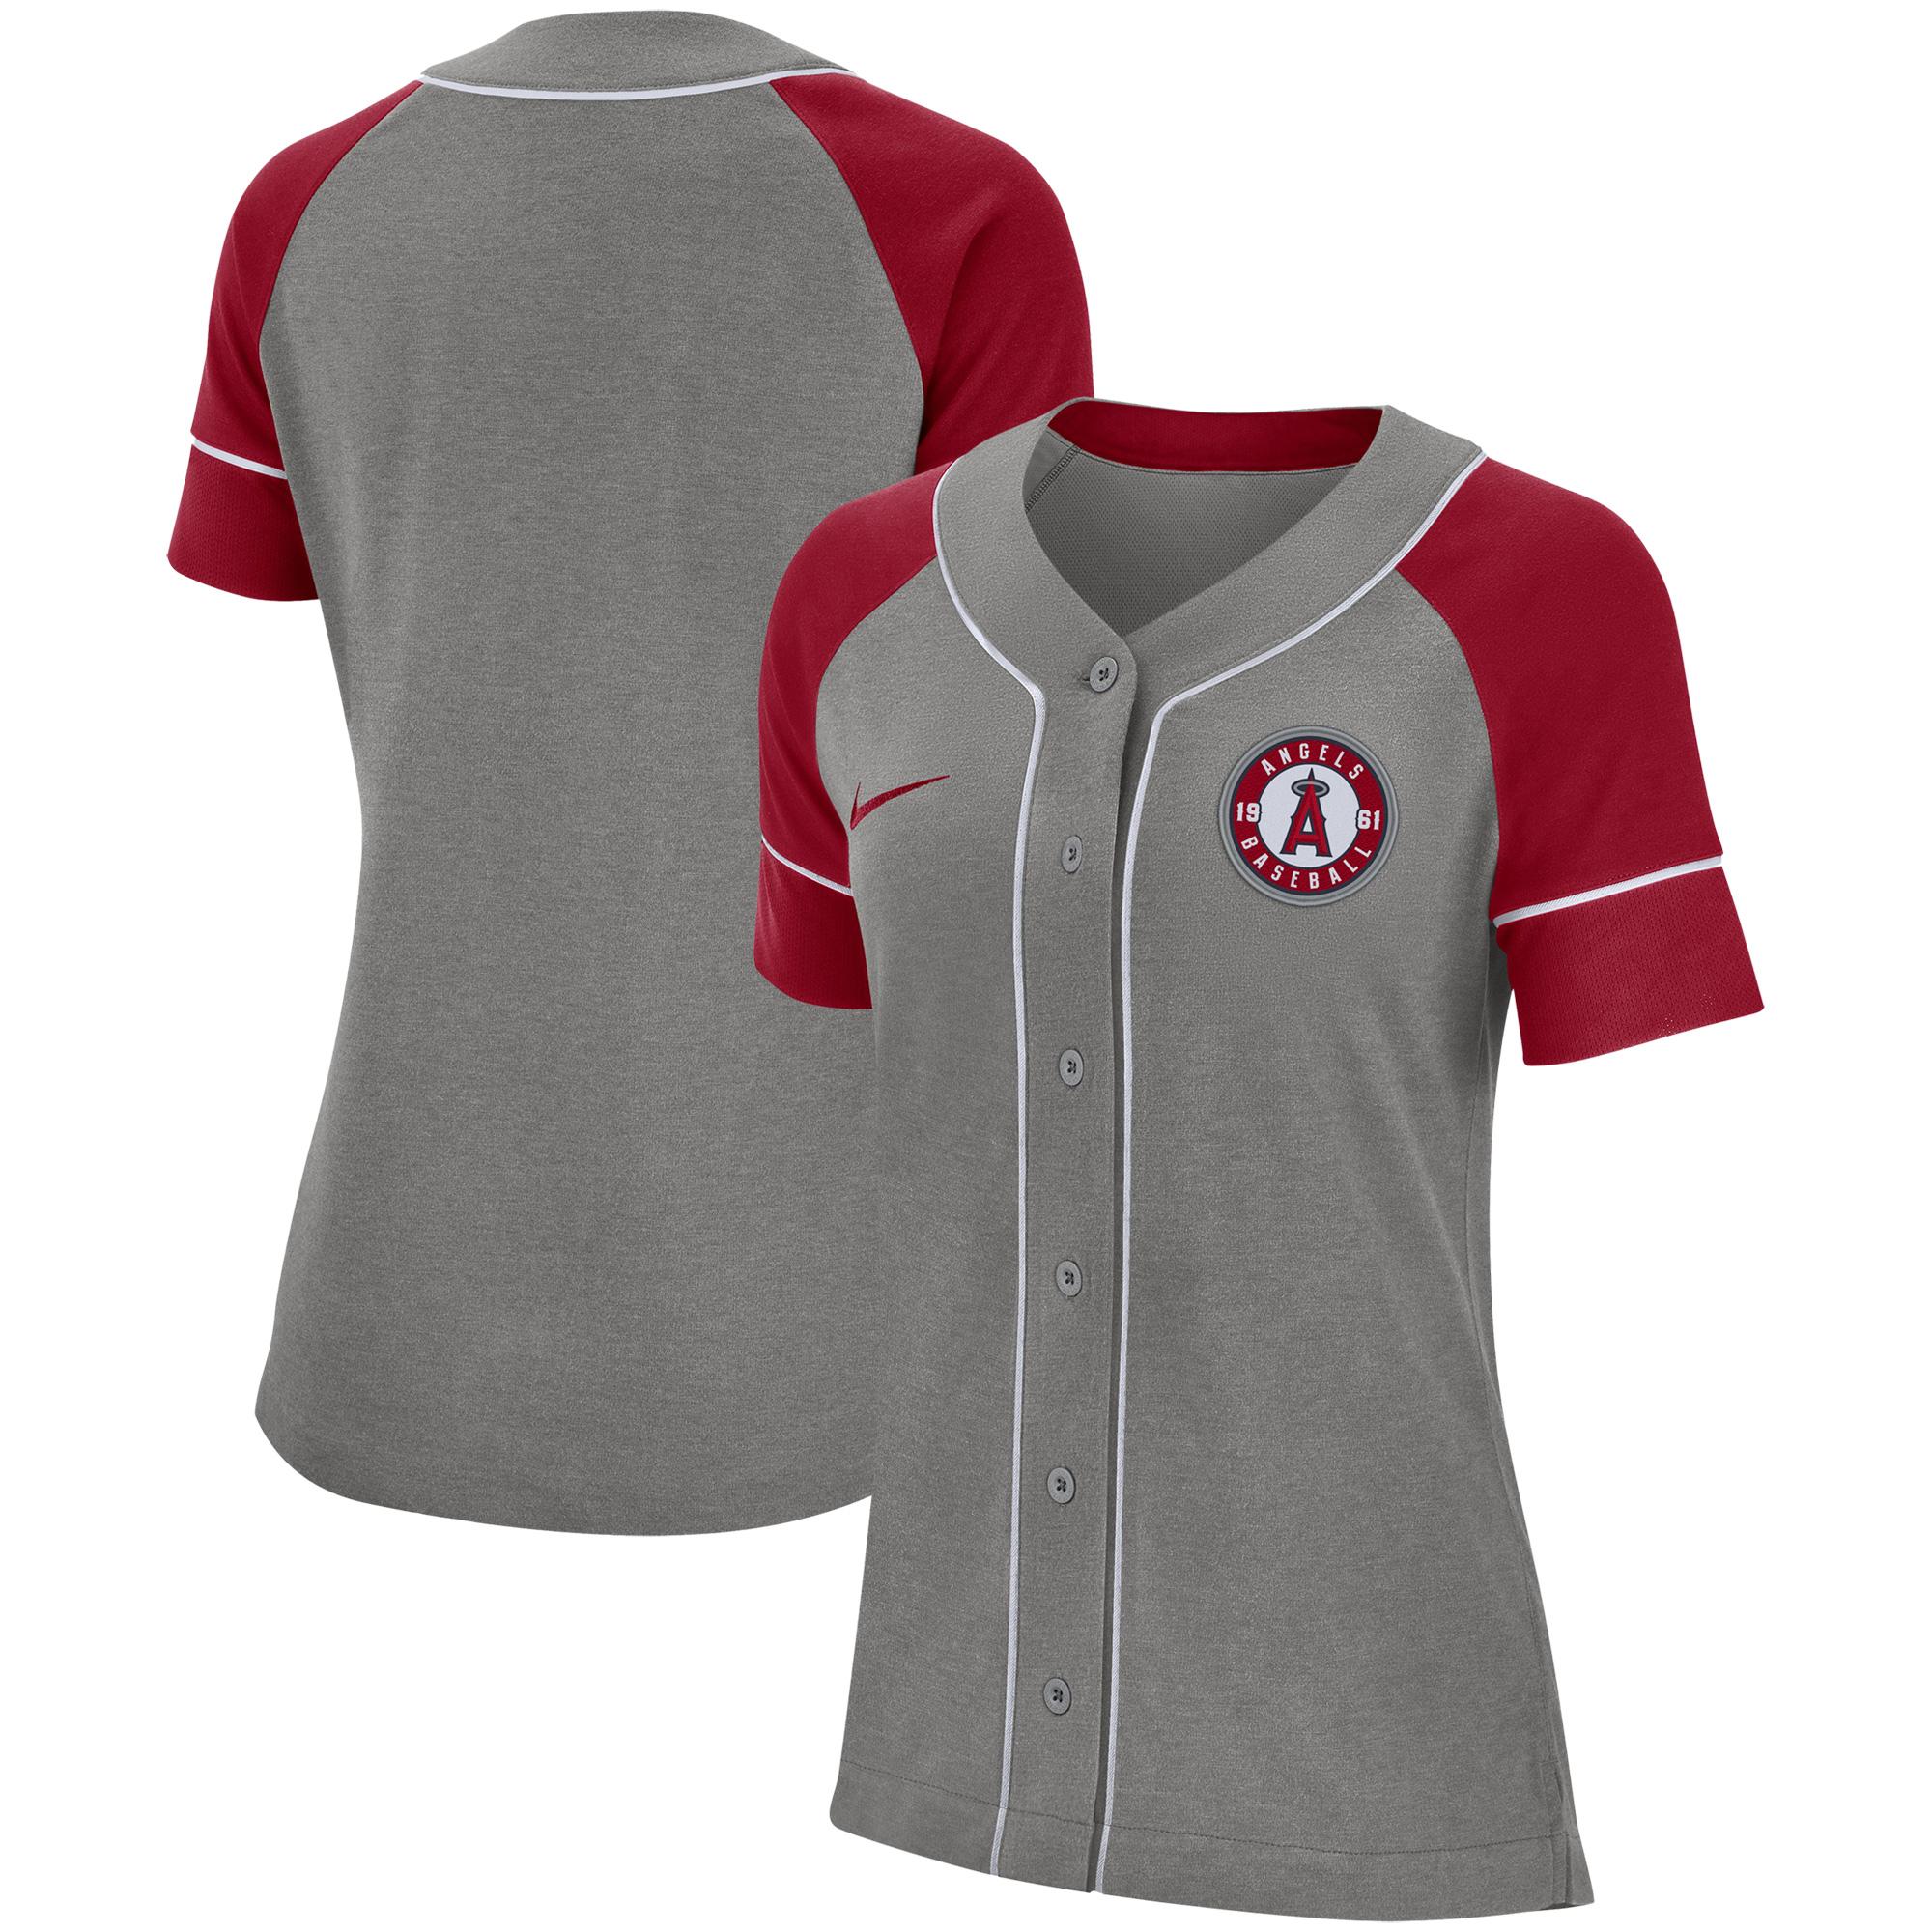 Los Angeles Angels Nike Women's Classic Baseball Jersey - Gray